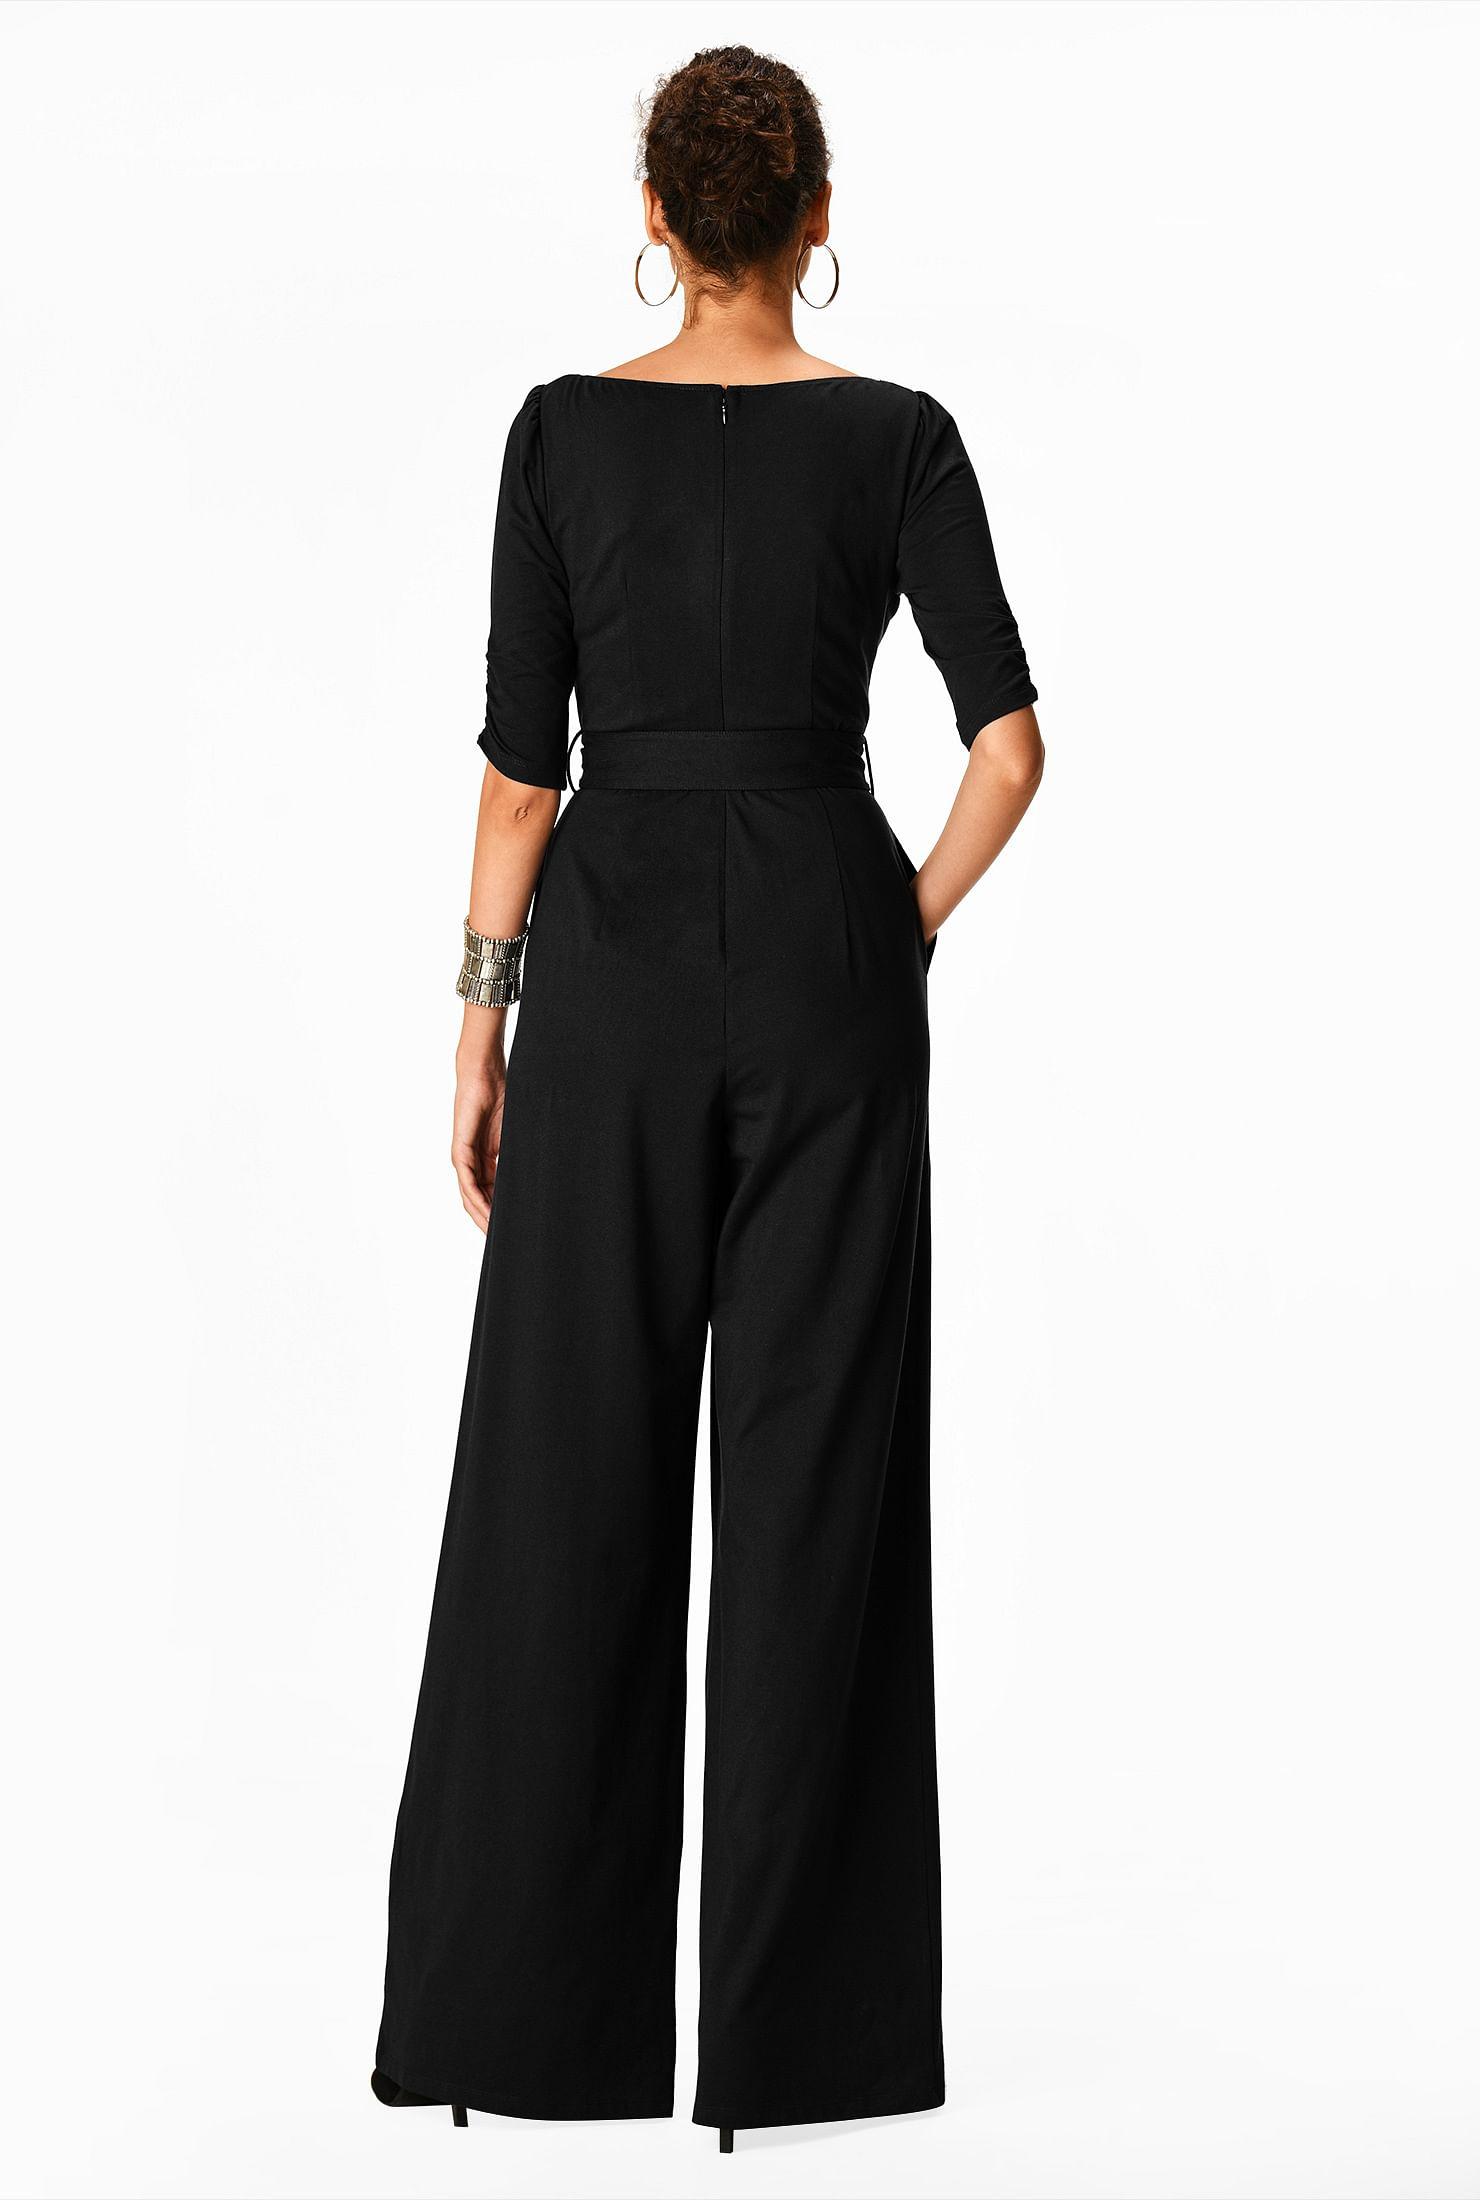 eShakti FX Zip Front Cotton Knit Palazzo Jumpsuit Customizable Neckline Sleeve /& Length